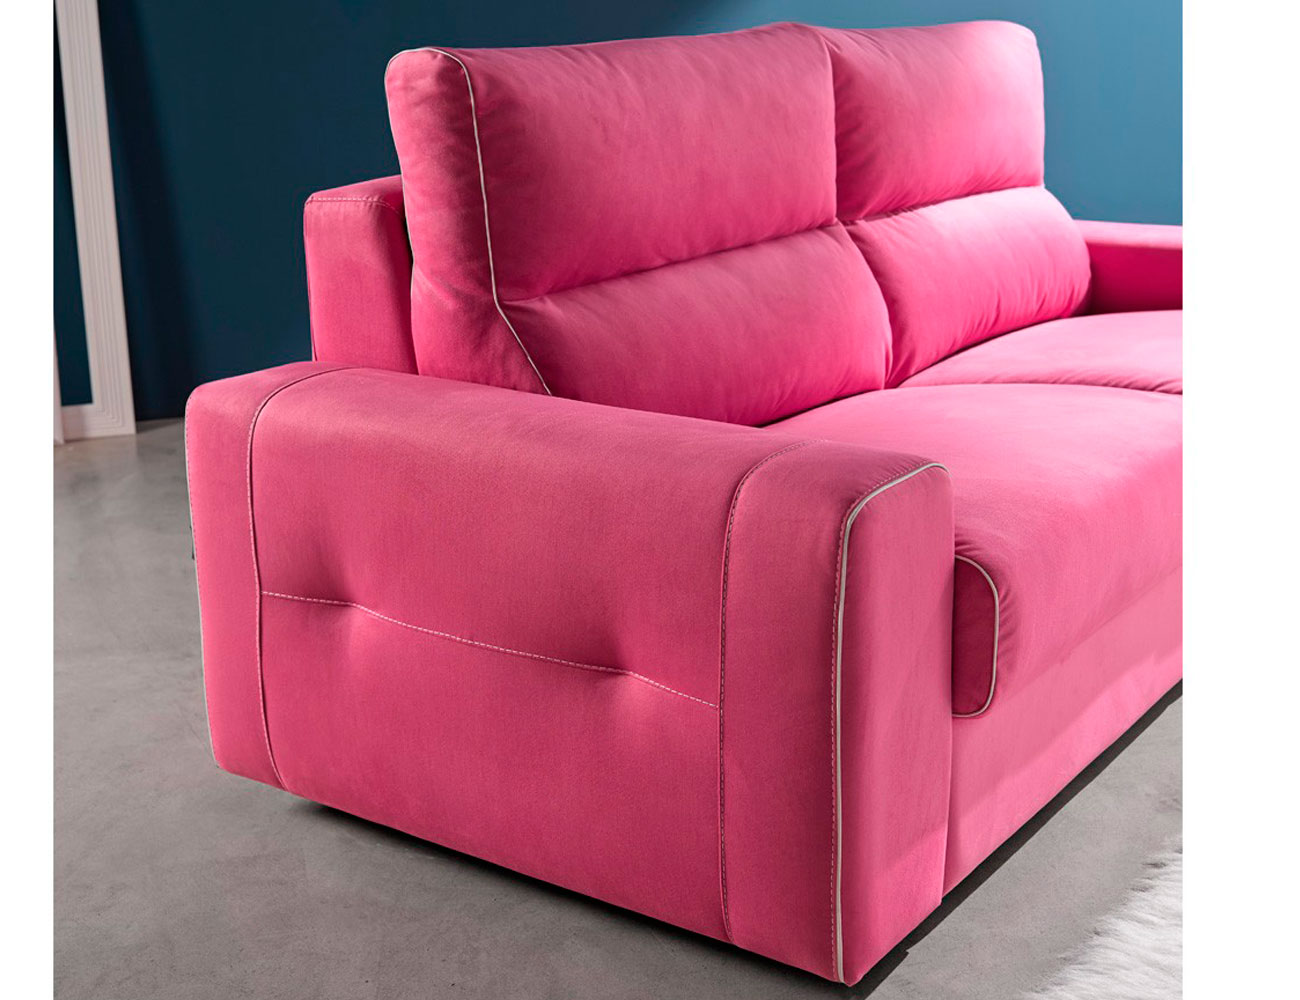 Sofa cama pedro ortiz apertura italiano 2